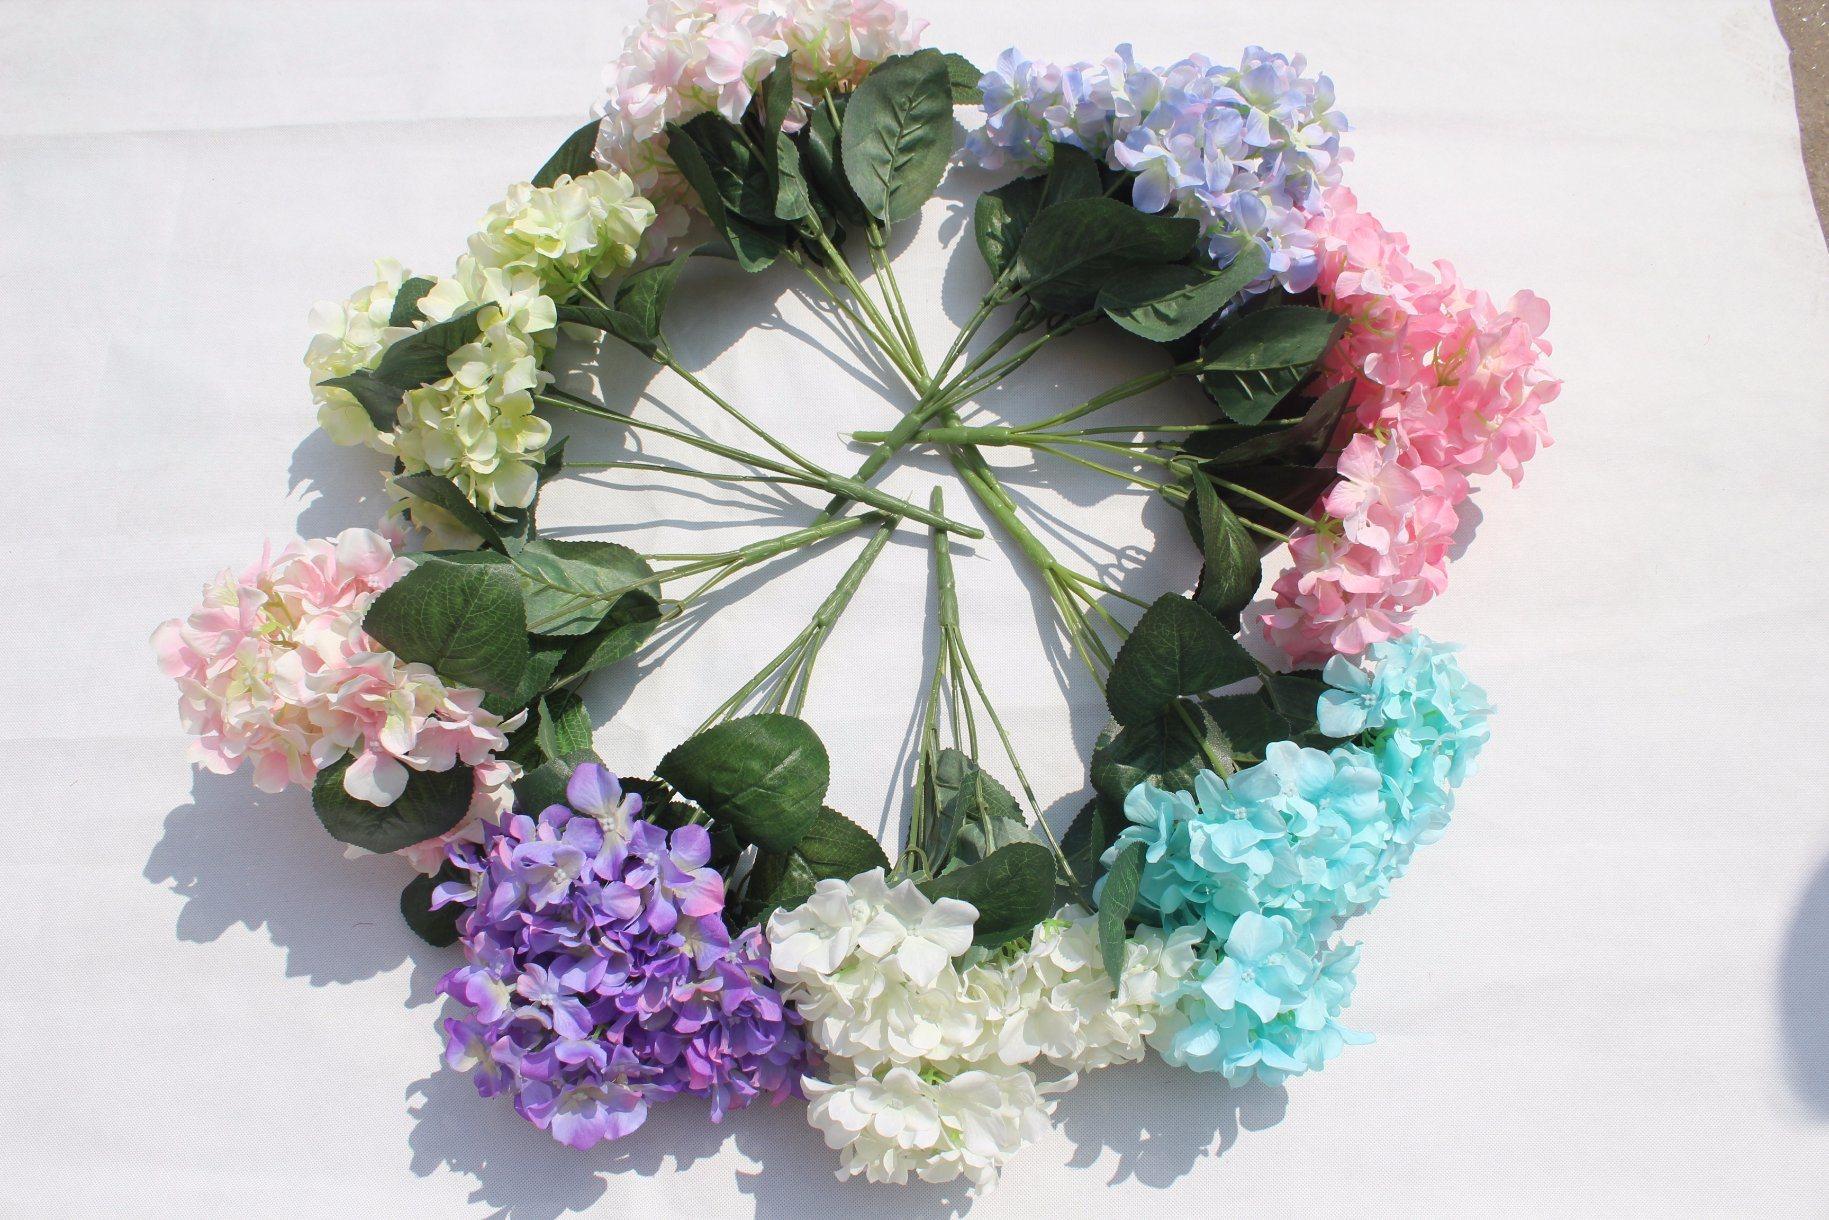 China Silk Artificial Hydrangea Flowers For Home Decor Wedding